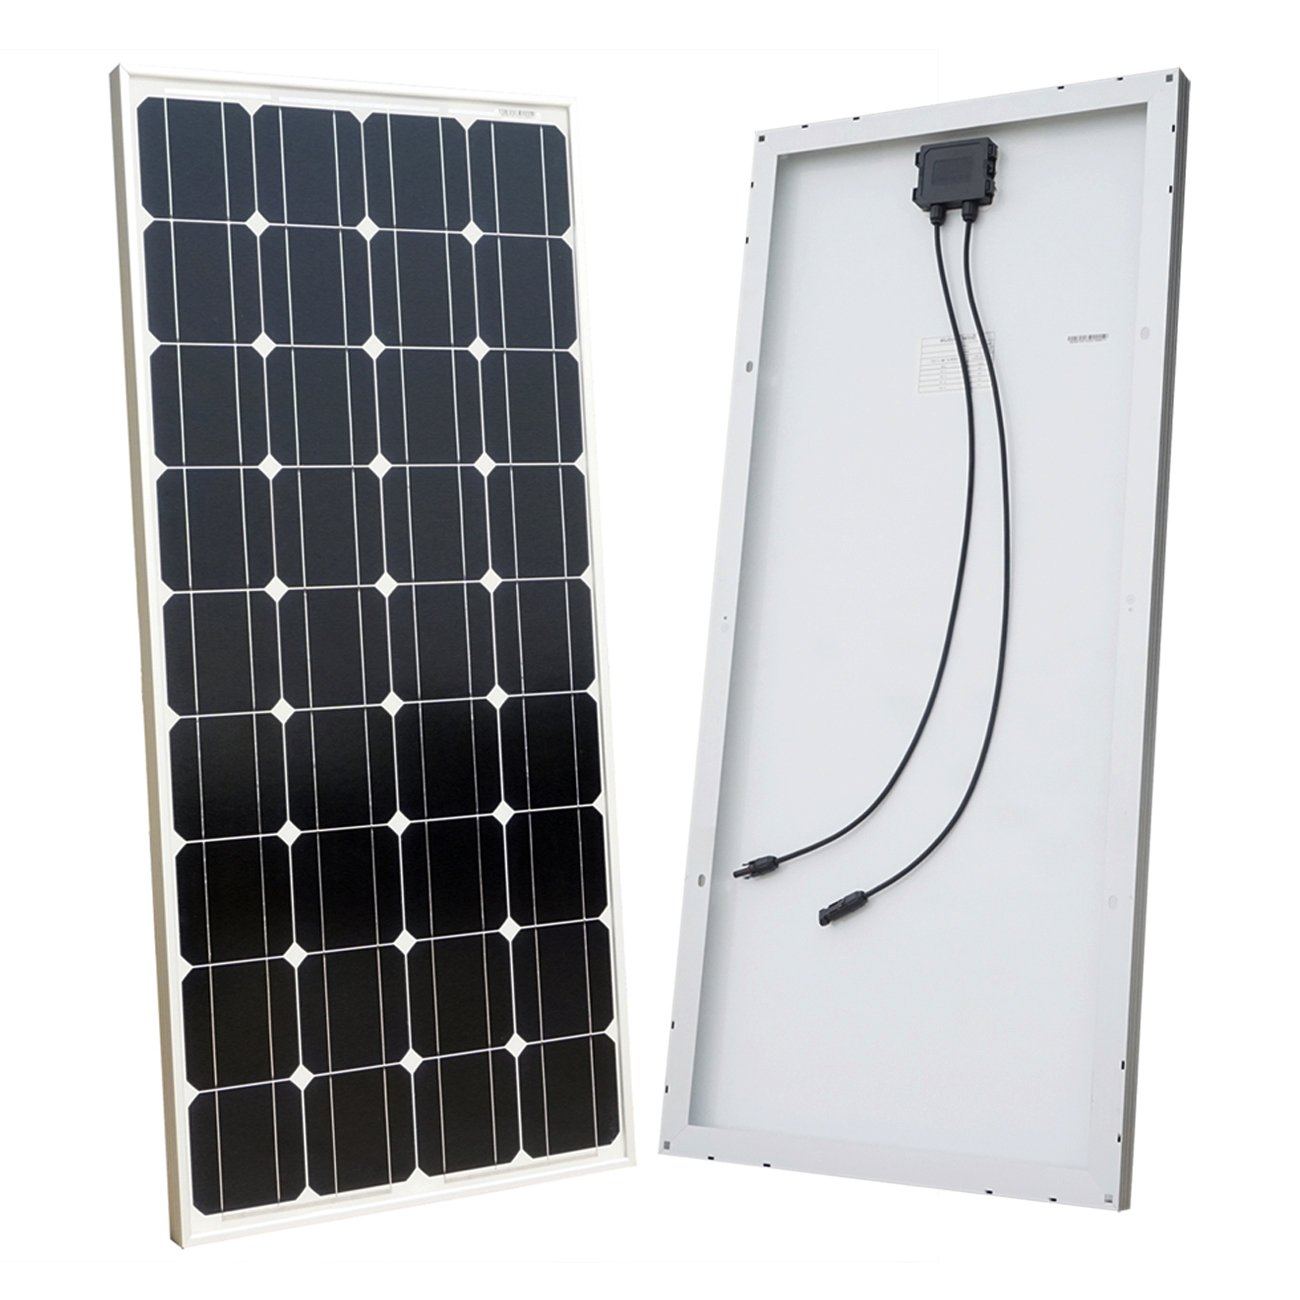 ECO-WORTHY 100 Watt Solar Panel 12 Volts Monocrystalline Solar Panel High Efficiency Mono Module RV Marine Boat Off Grid by ECO-WORTHY (Image #1)